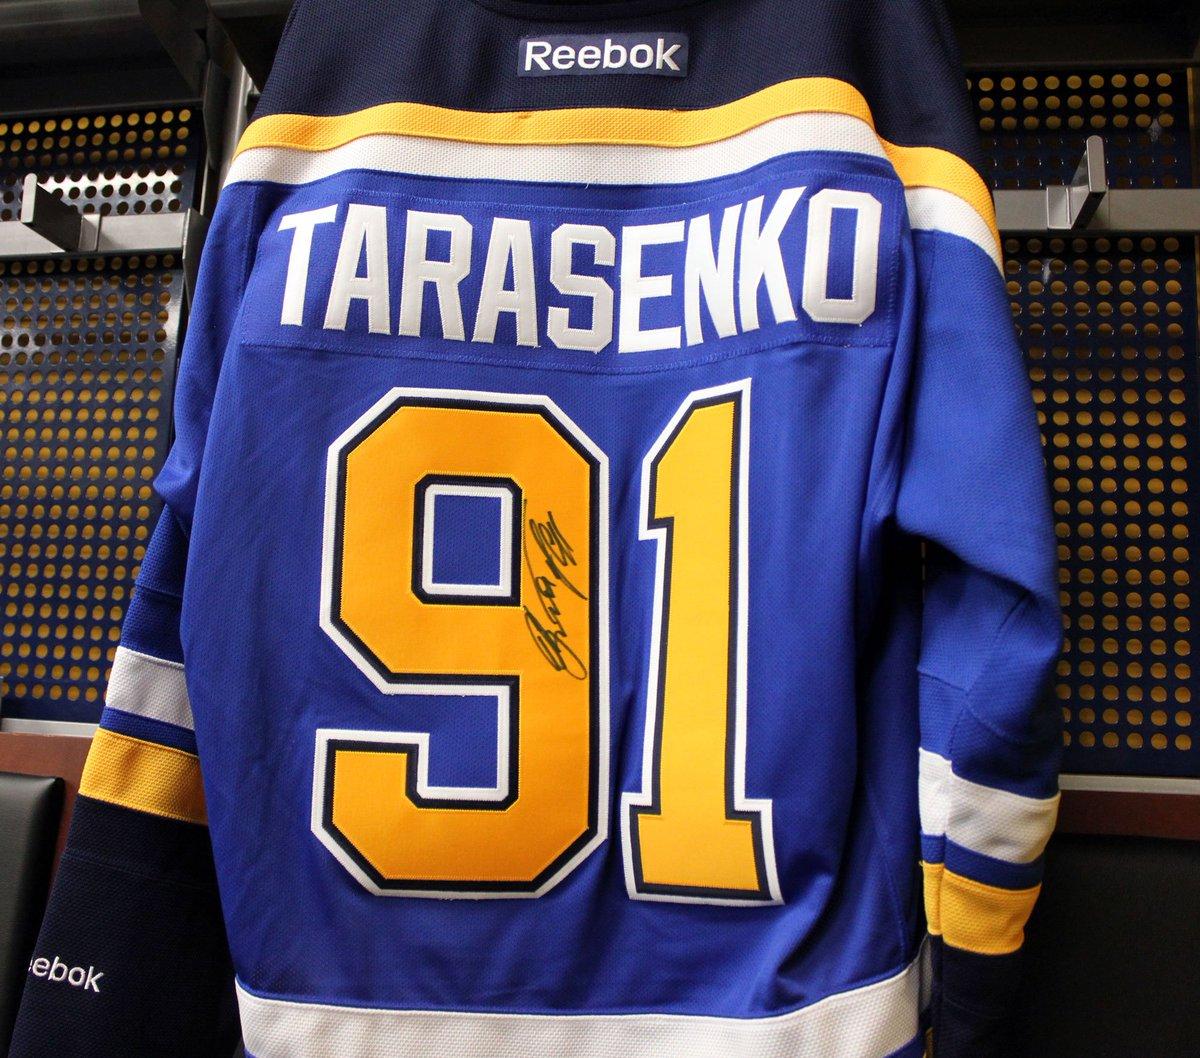 Last chance to win this signed Tarasenko jersey! RT & use #NHL17Tarasenko to enter. Winner will be announced Monday. https://t.co/lU7TJqJ9RF